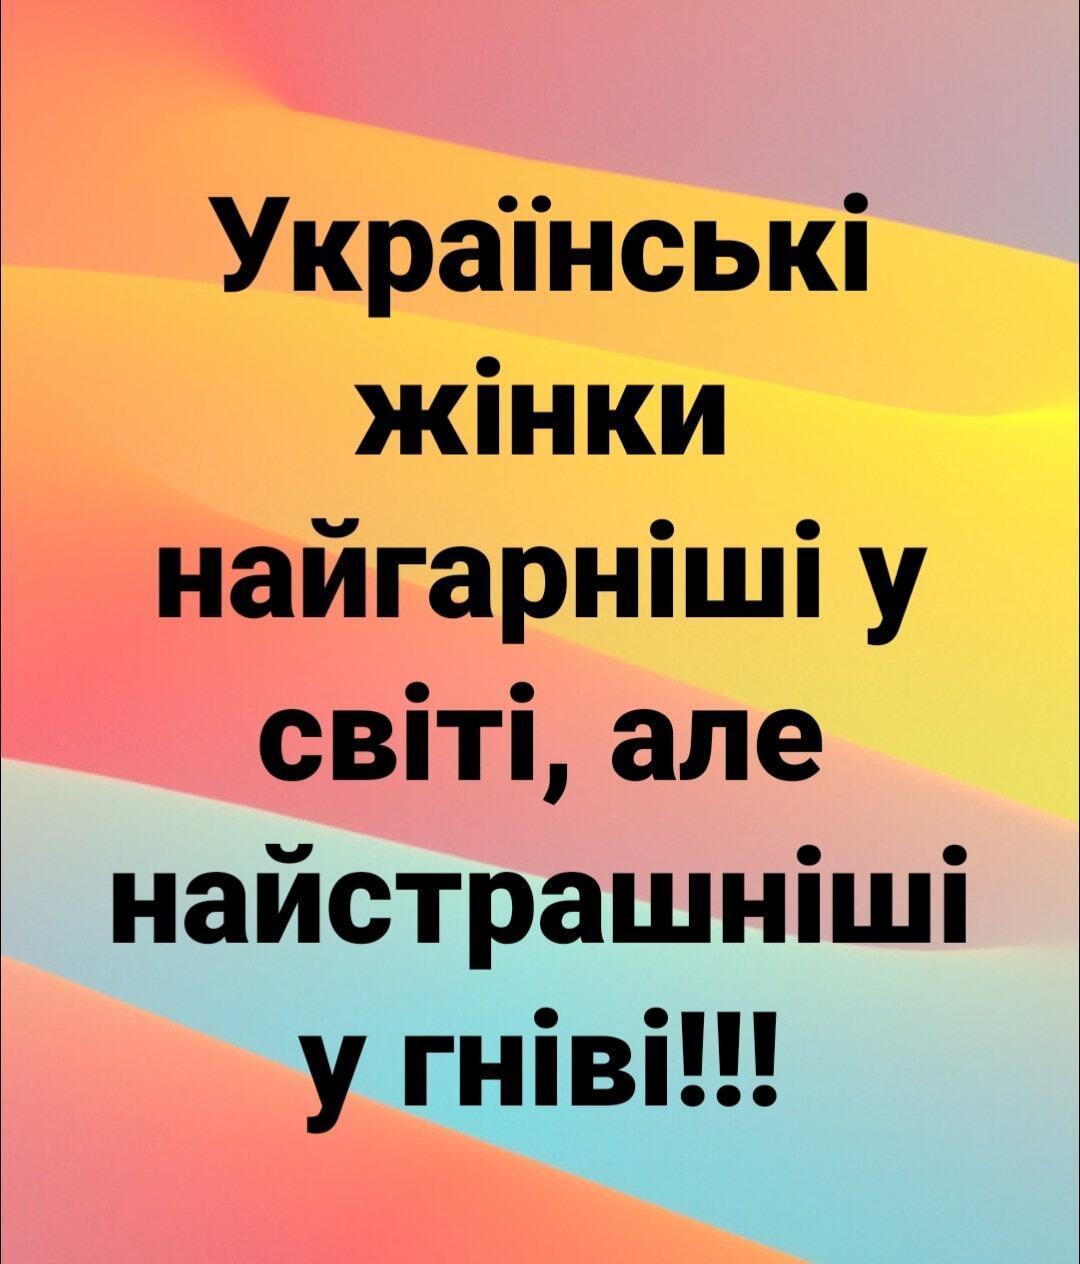 Анекдот про українських жінок